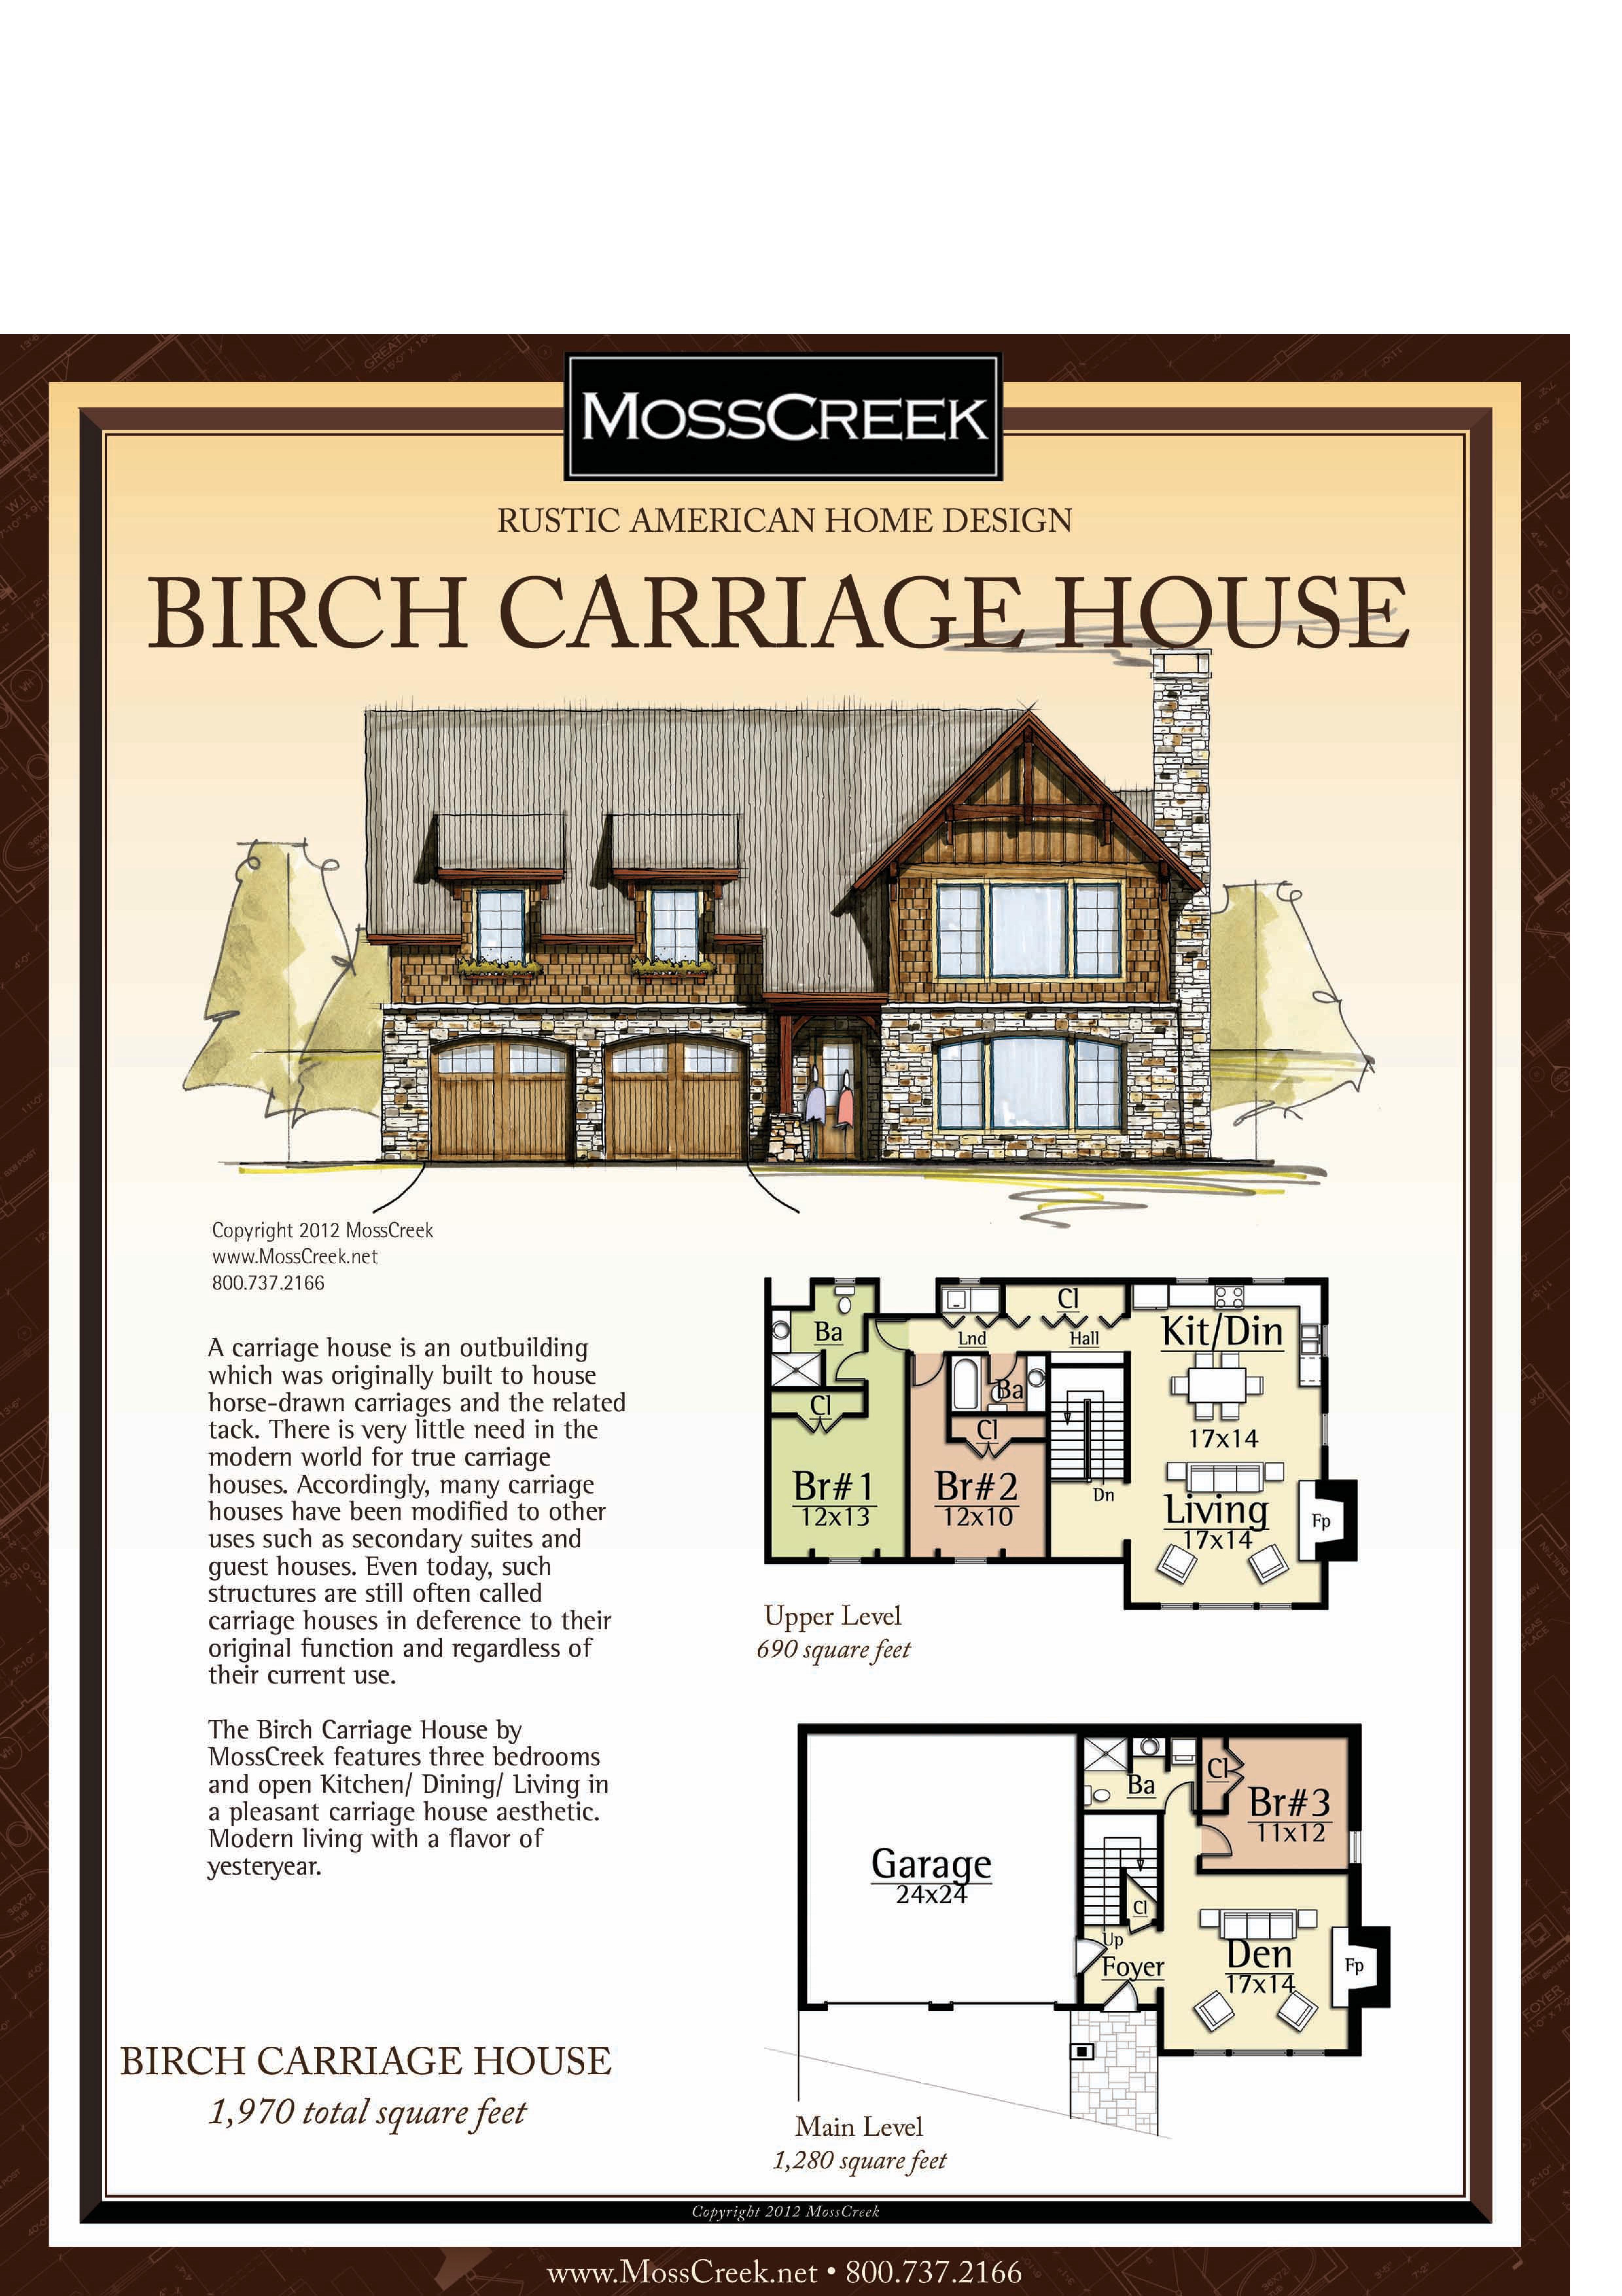 Moss Creek Birch Carriage House Houseplans